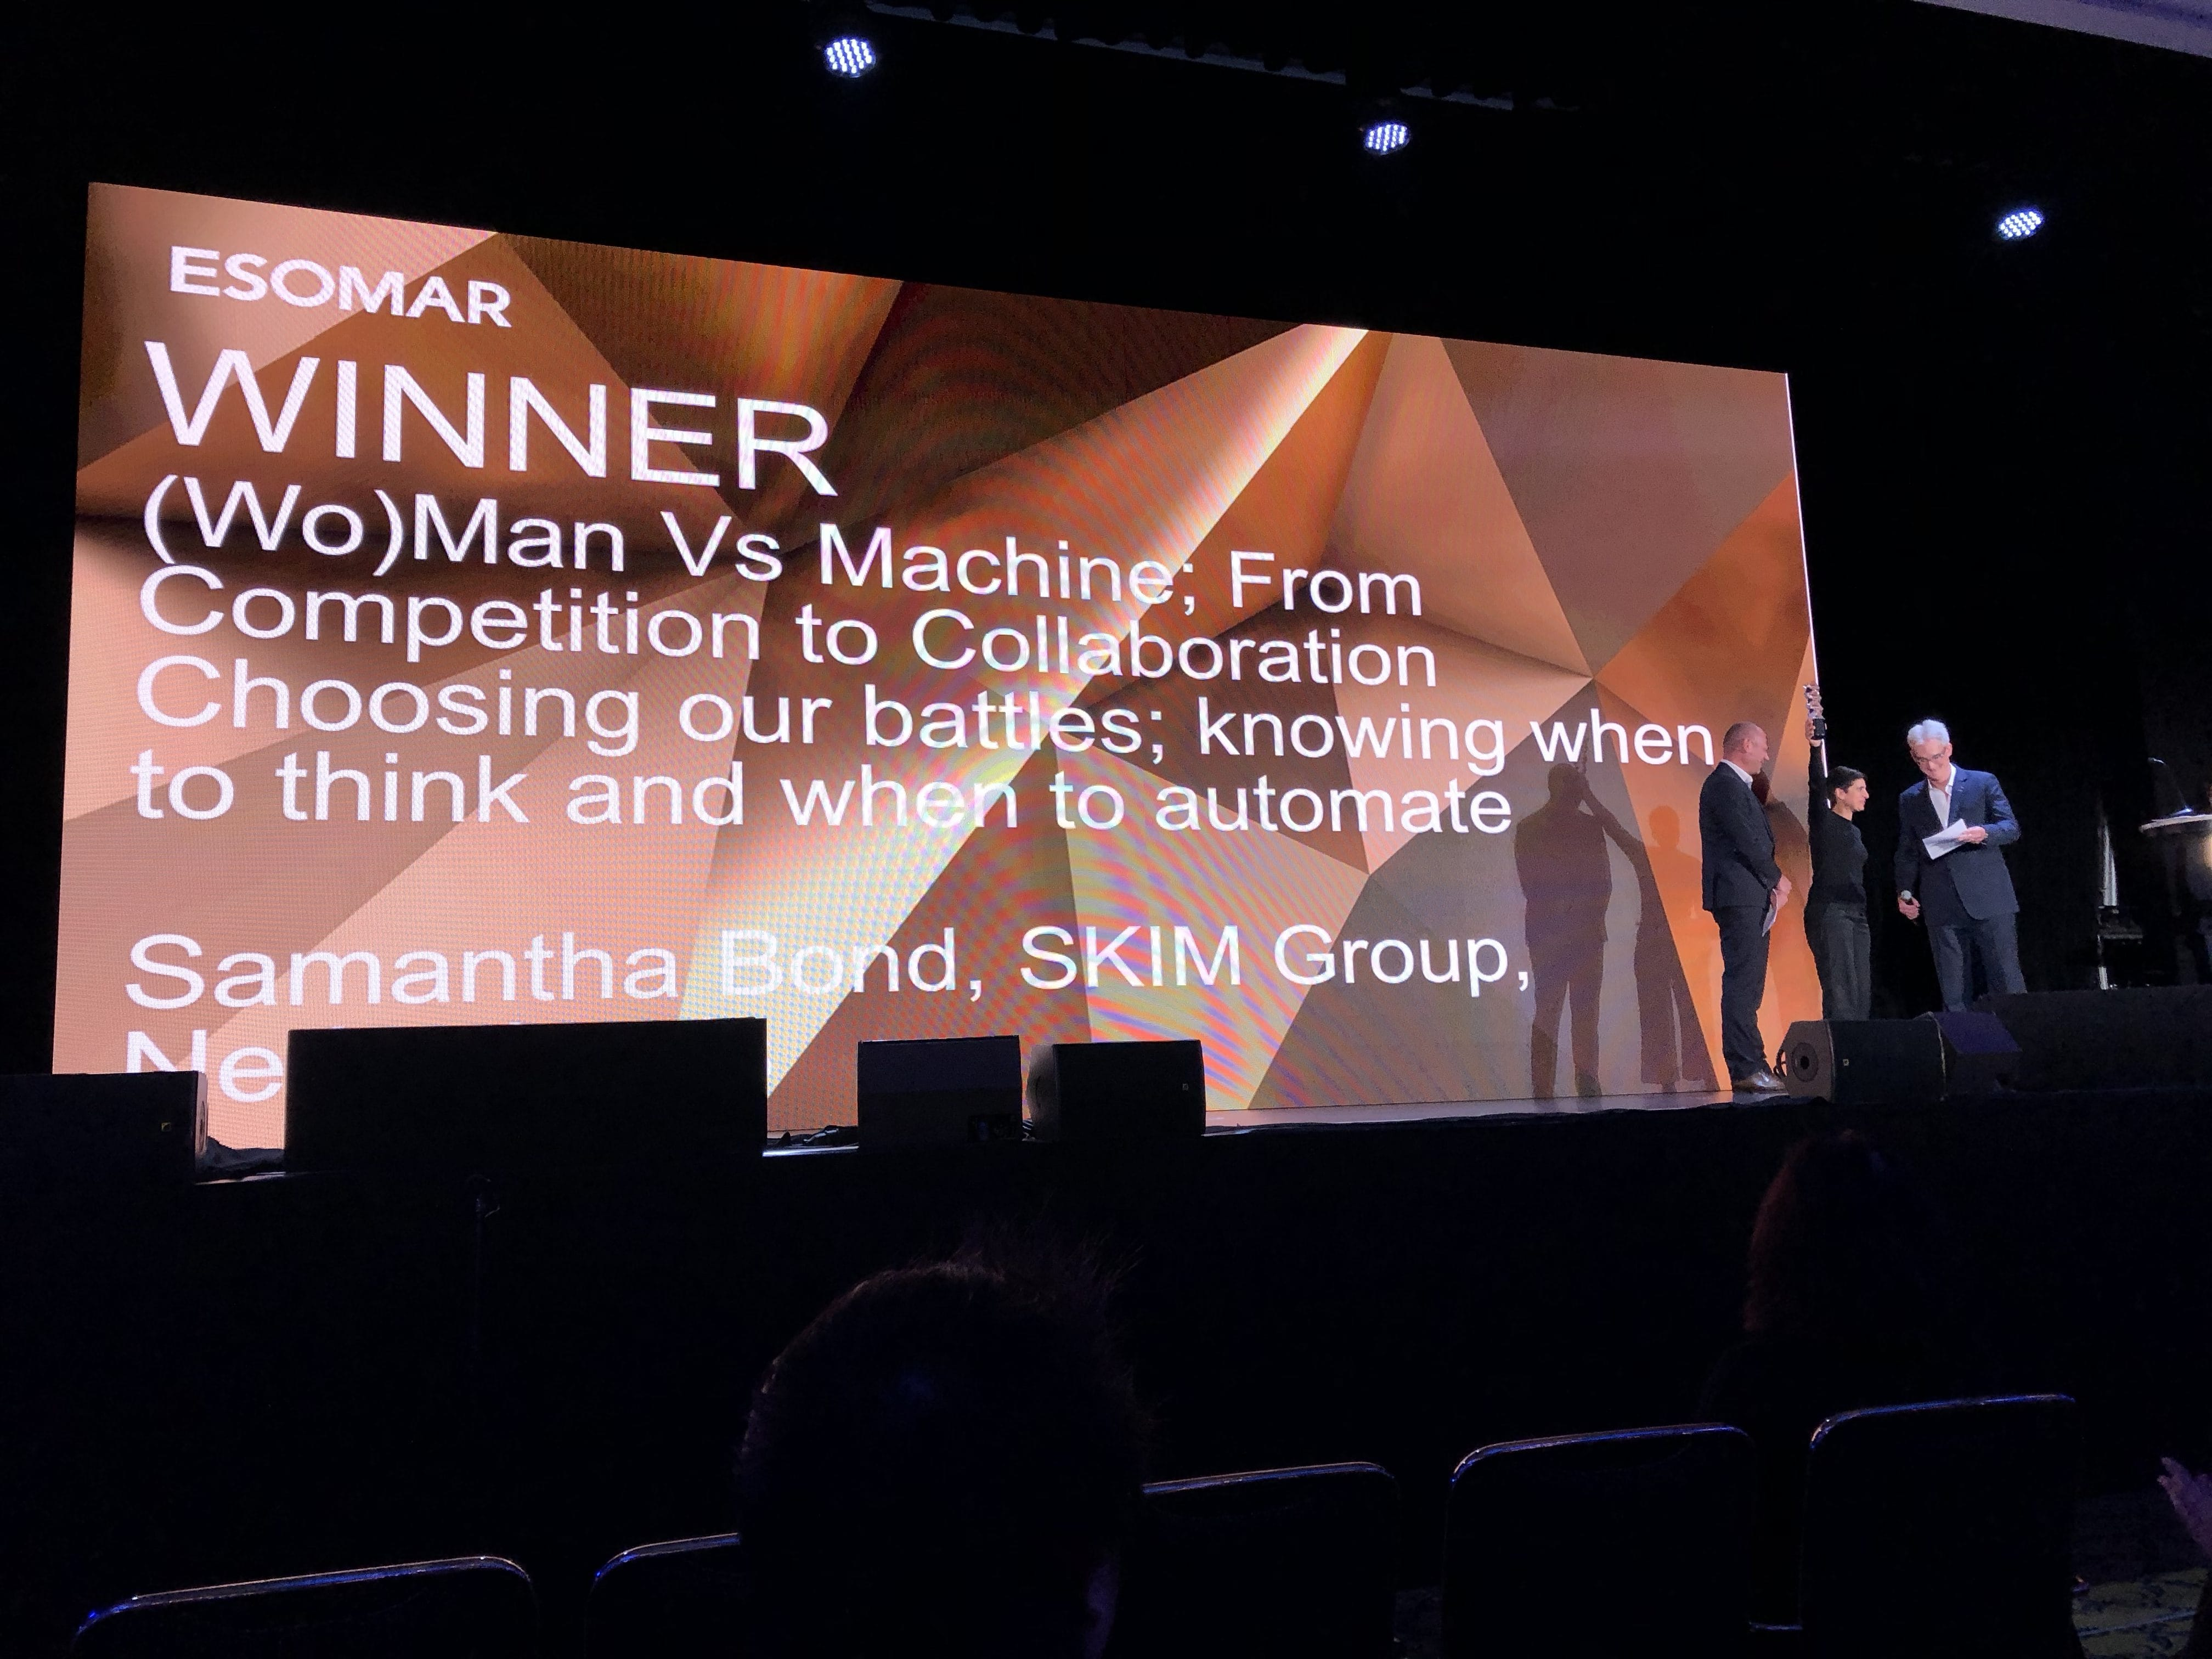 SKIM won ESOMAR Best Paper Award 2017/2018